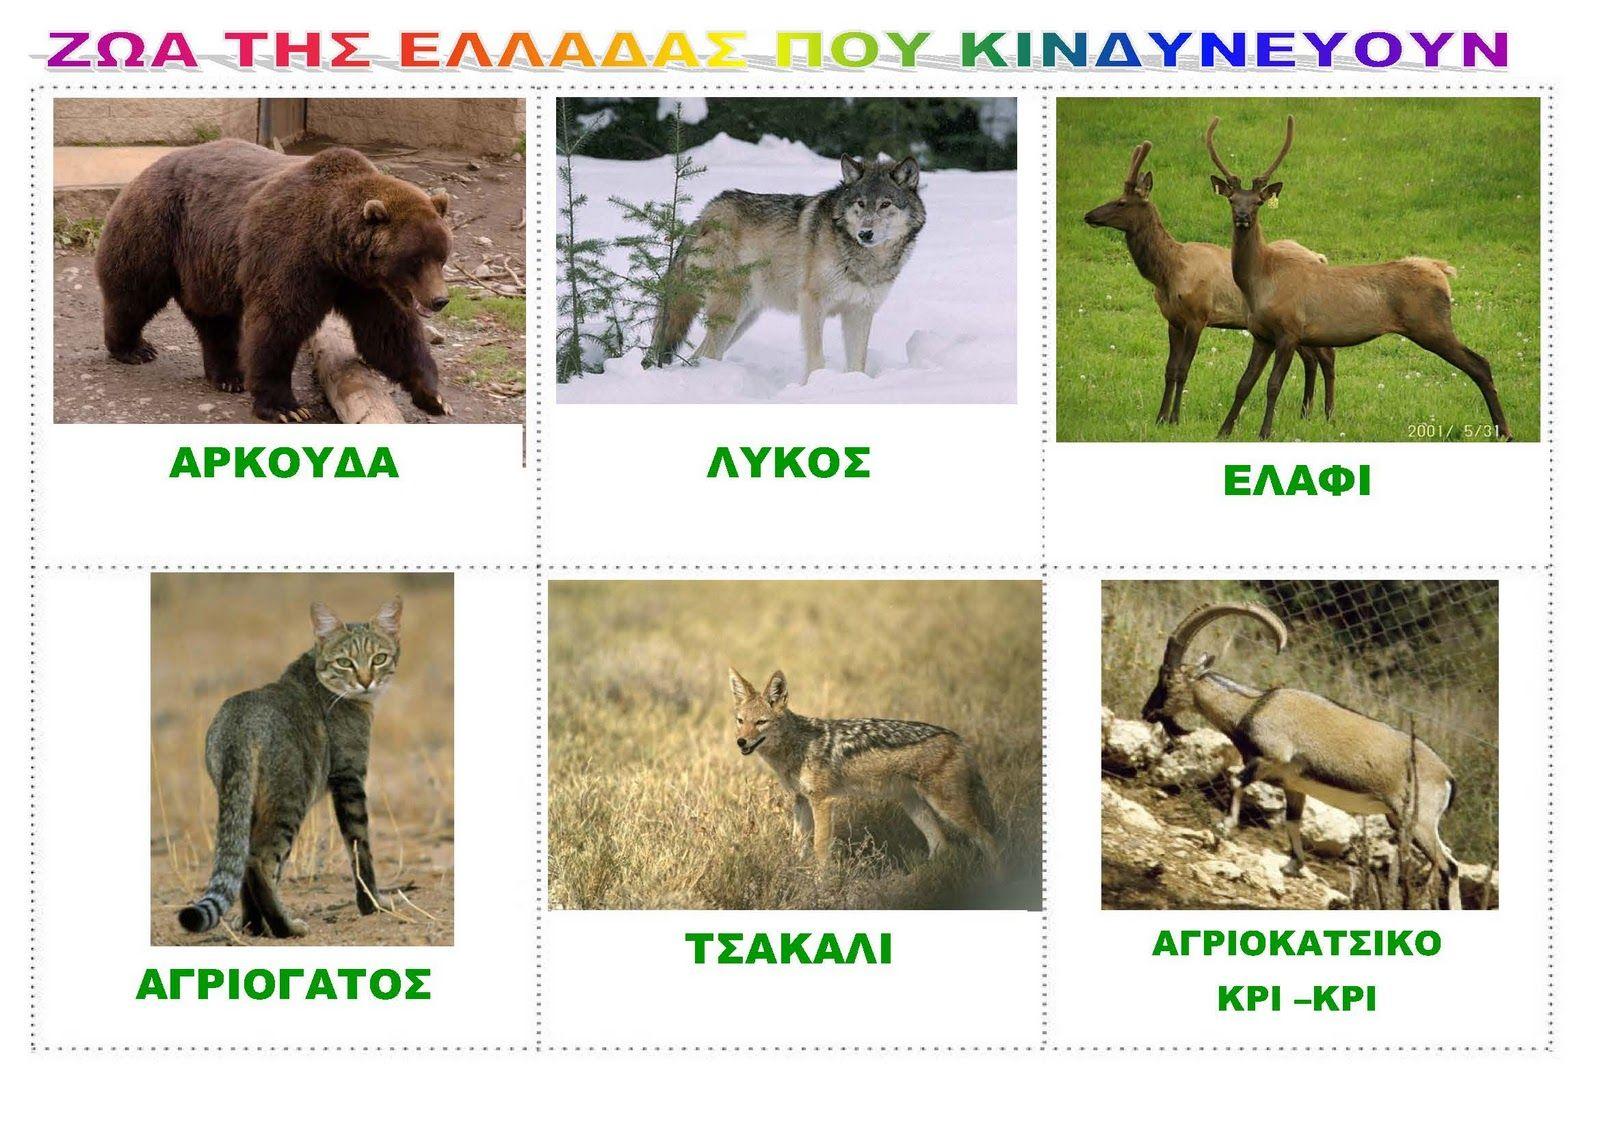 dreamskindergarten Το νηπιαγωγείο που ονειρεύομαι !: Πίνακες αναφοράς με τα ζώα της Ελλάδας που κινδυνεύουν